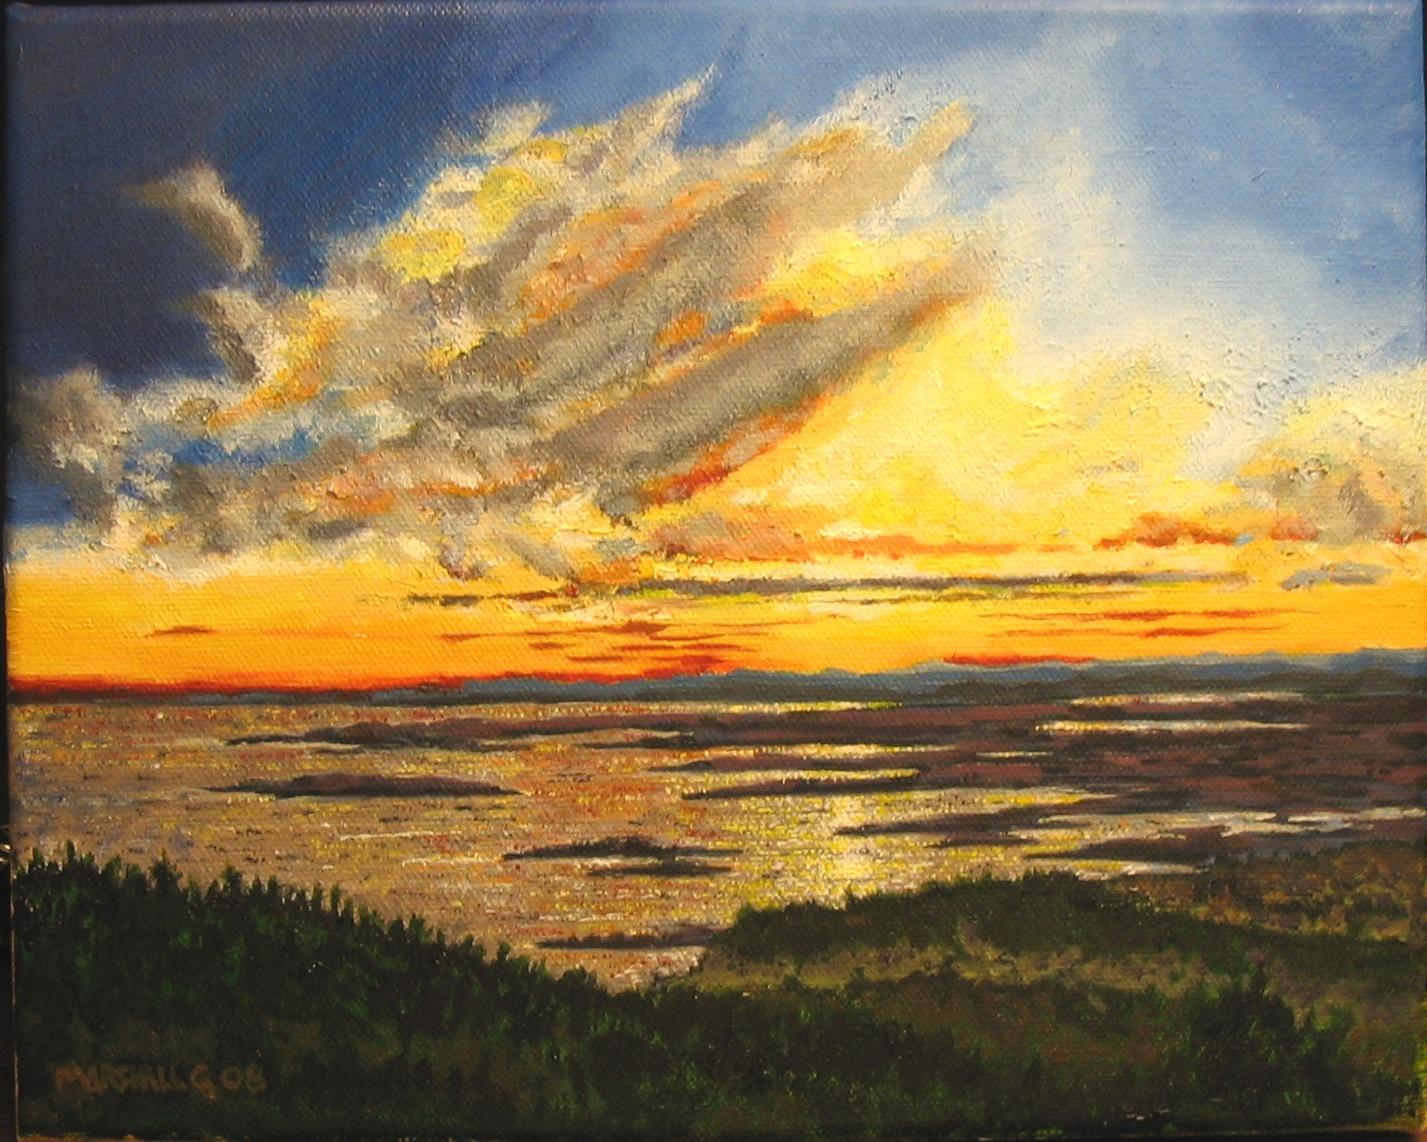 Sunset over the Maine Coast